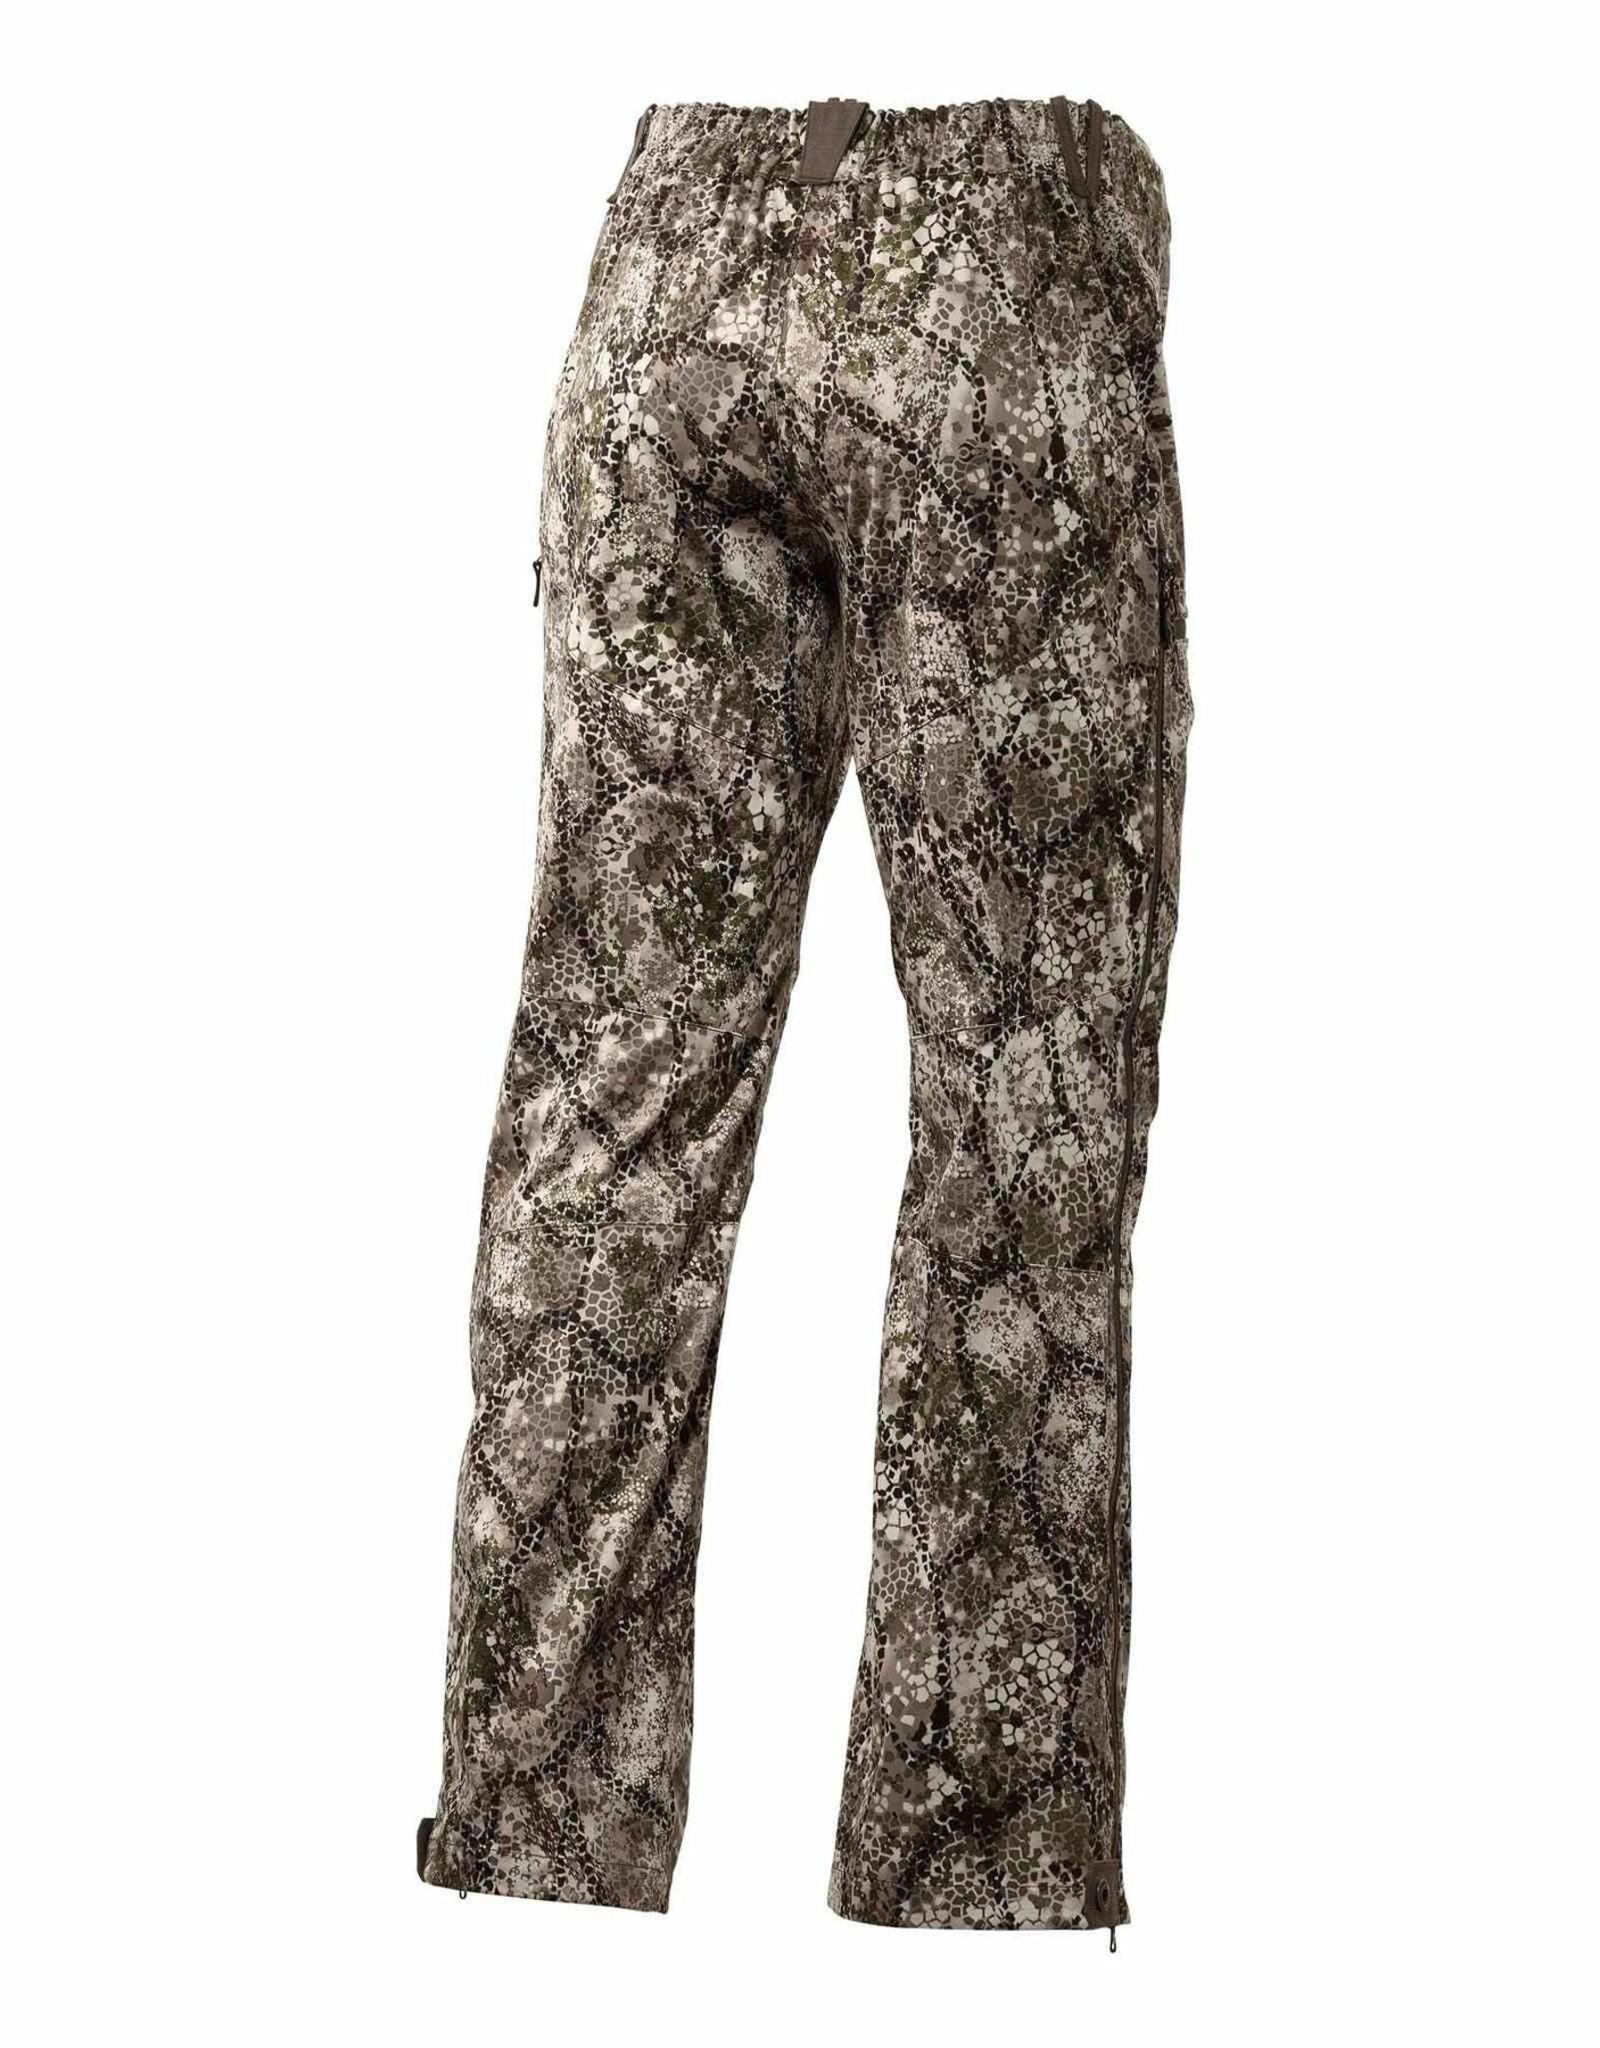 Badlands Exo Pants